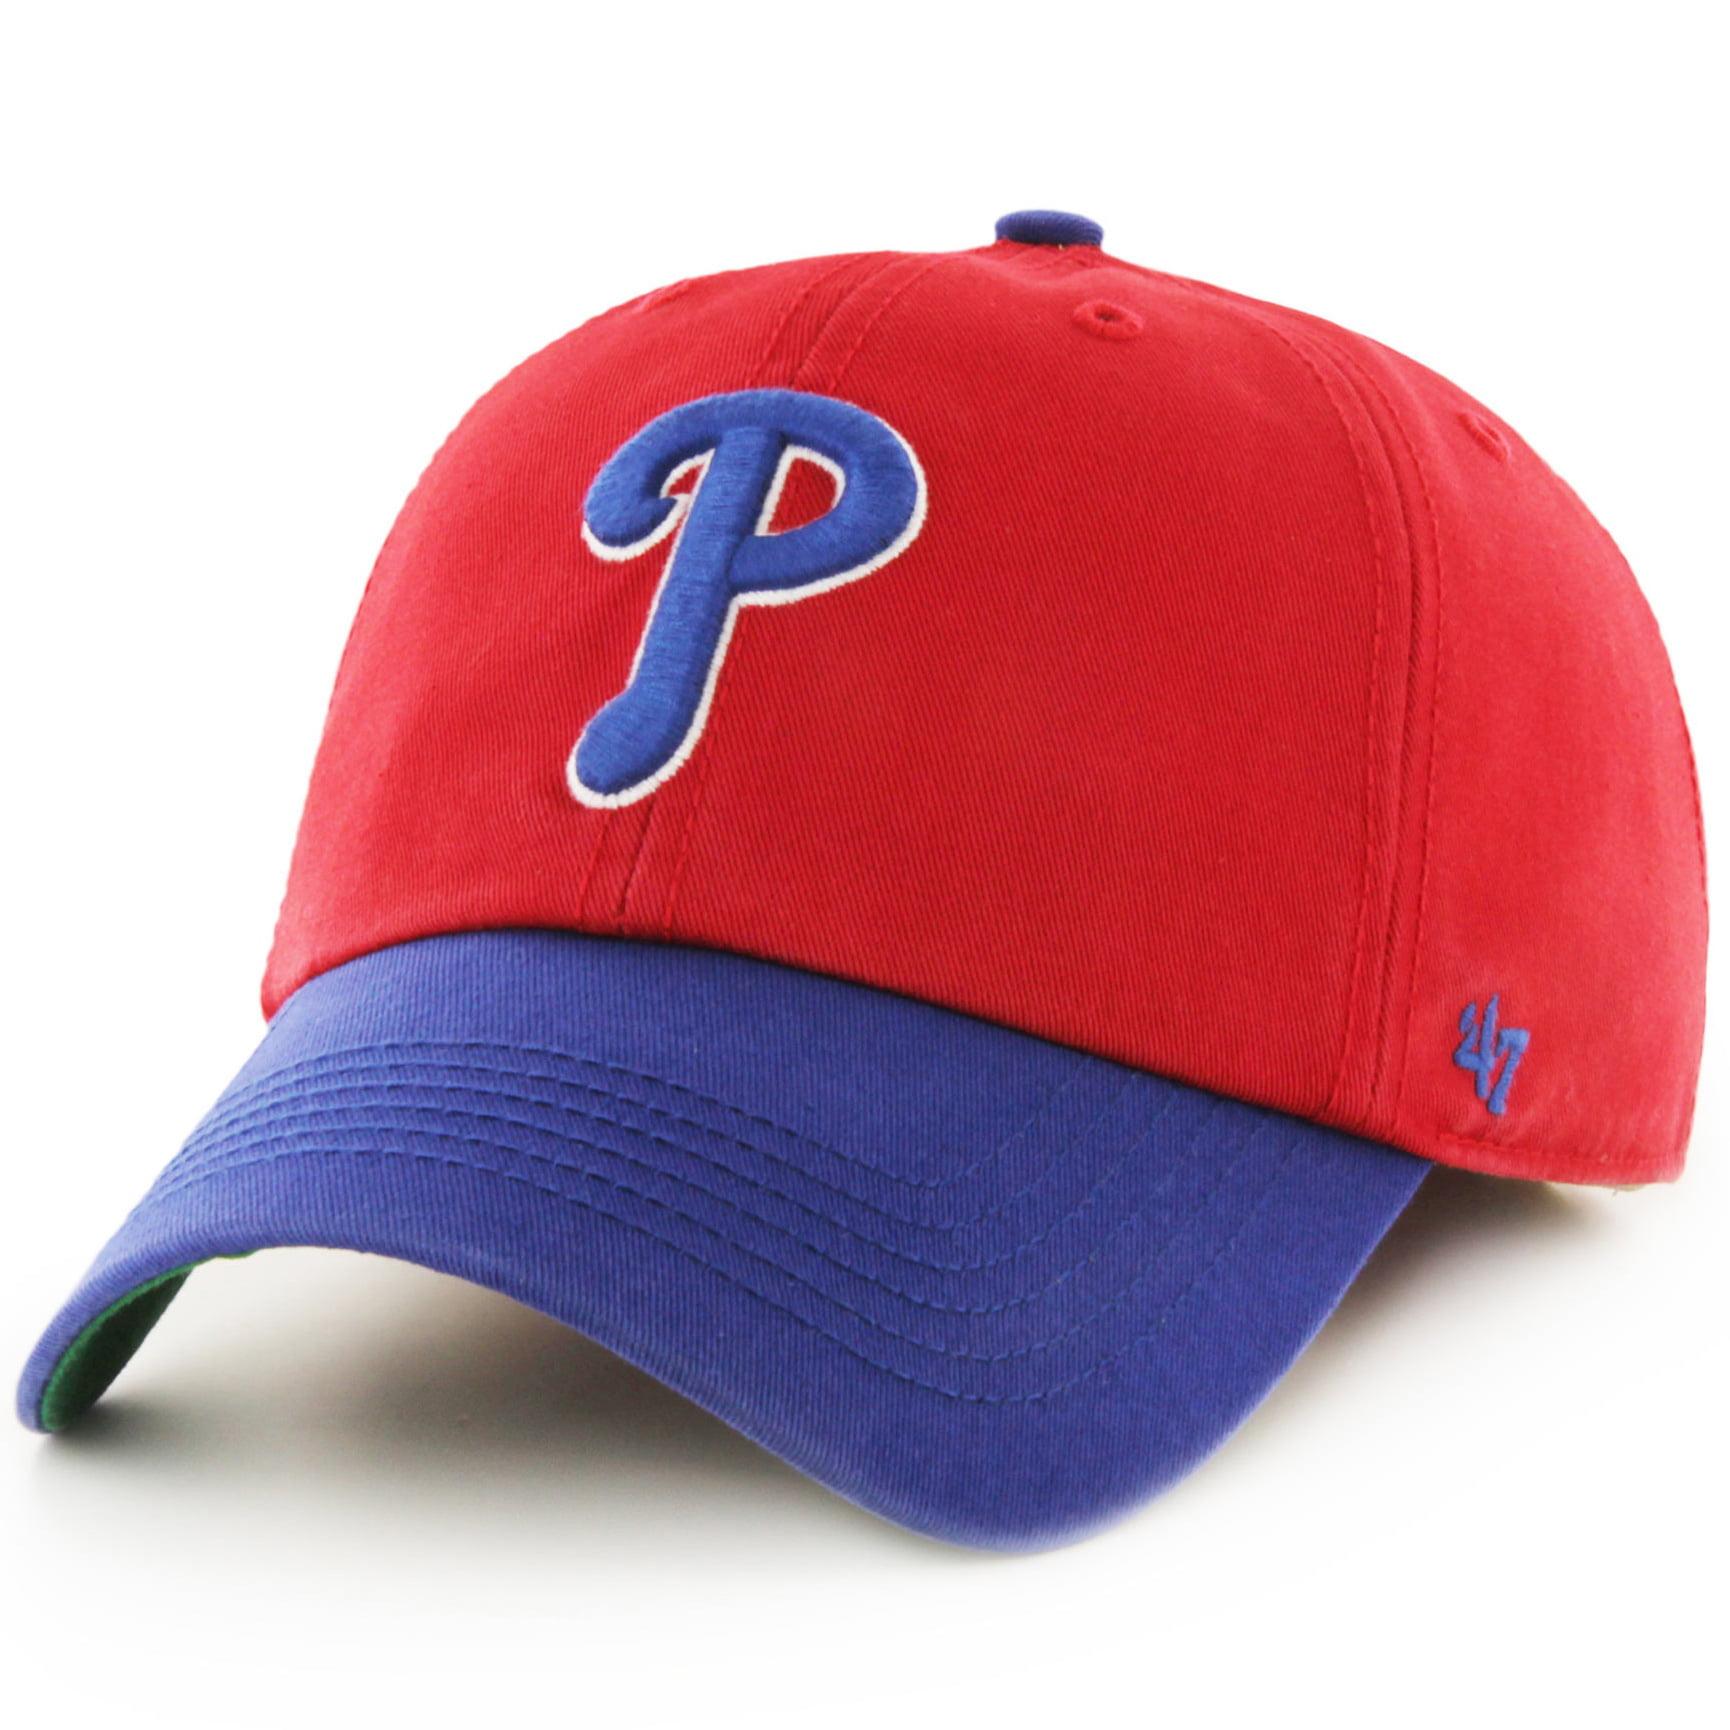 on sale 8e156 ff242 ... cap 5549d e494a norway philadelphia phillies 47 franchise batting  practice fitted hat red royal walmart 4ec12 a3cb3 ...